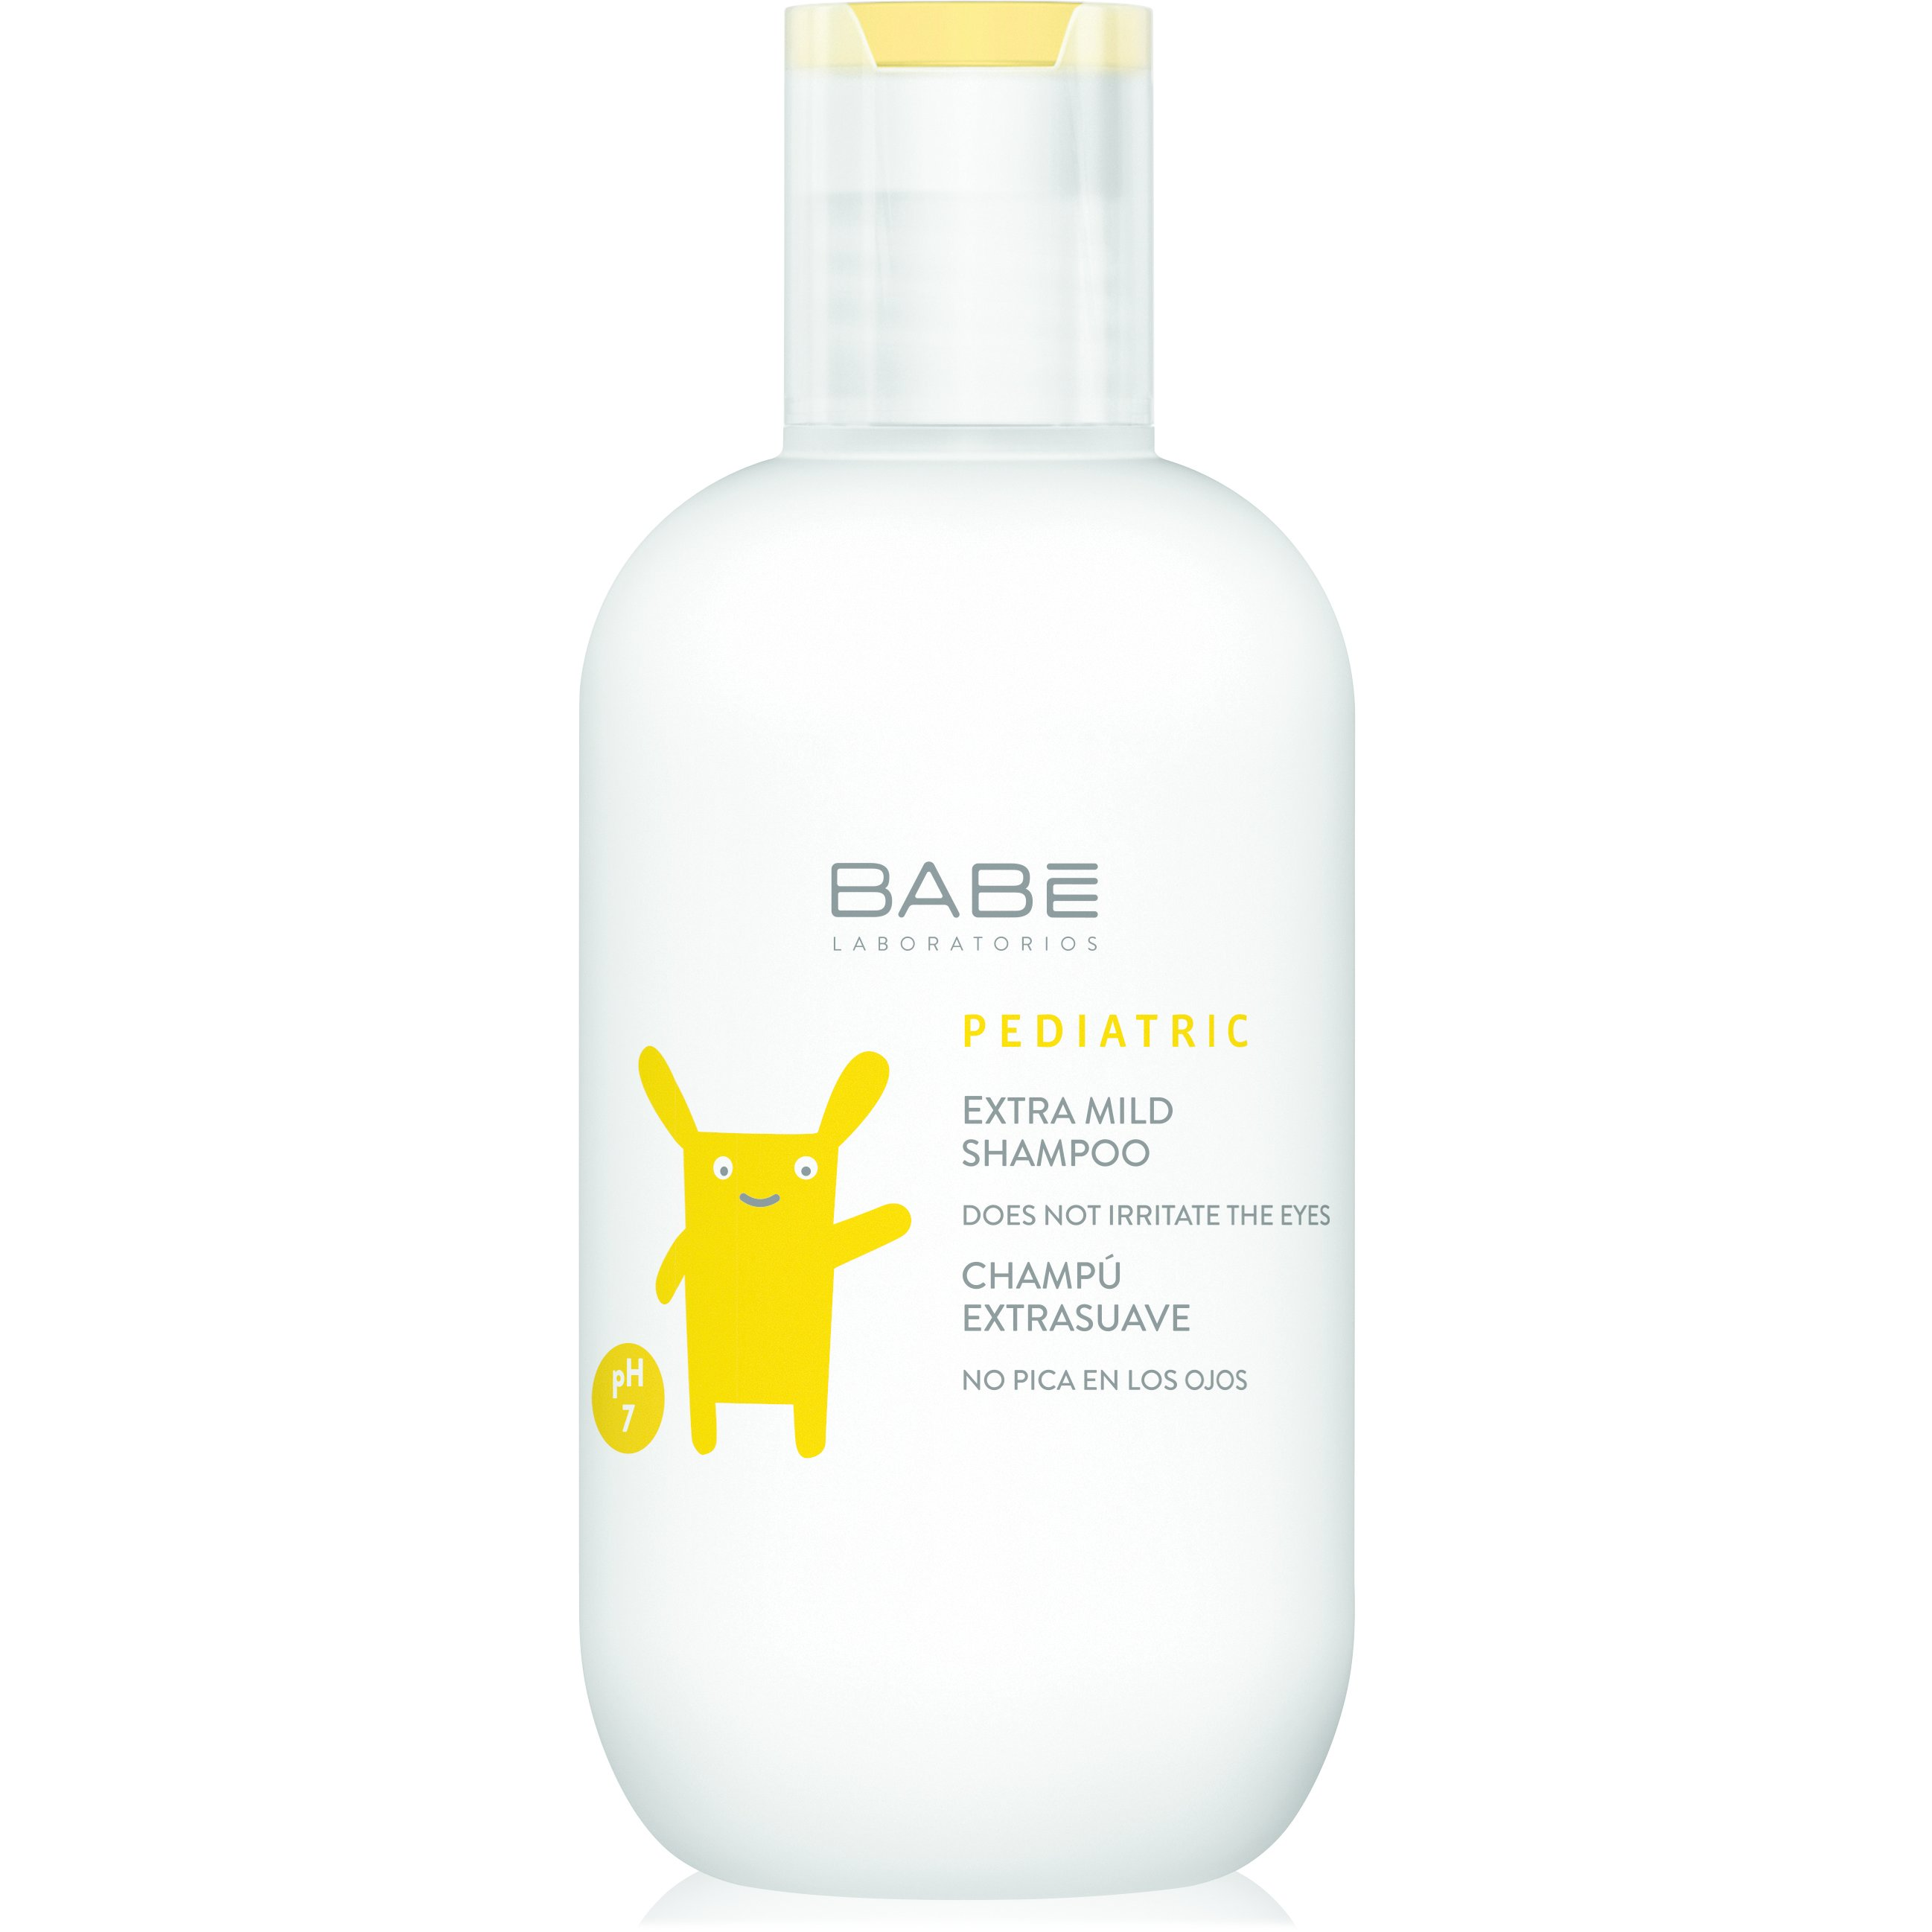 Babe Pediatric Extra Mild Shampoo Ήπιο Σαμπουάν Καθημερινής Χρήσης για Βρέφη 200ml